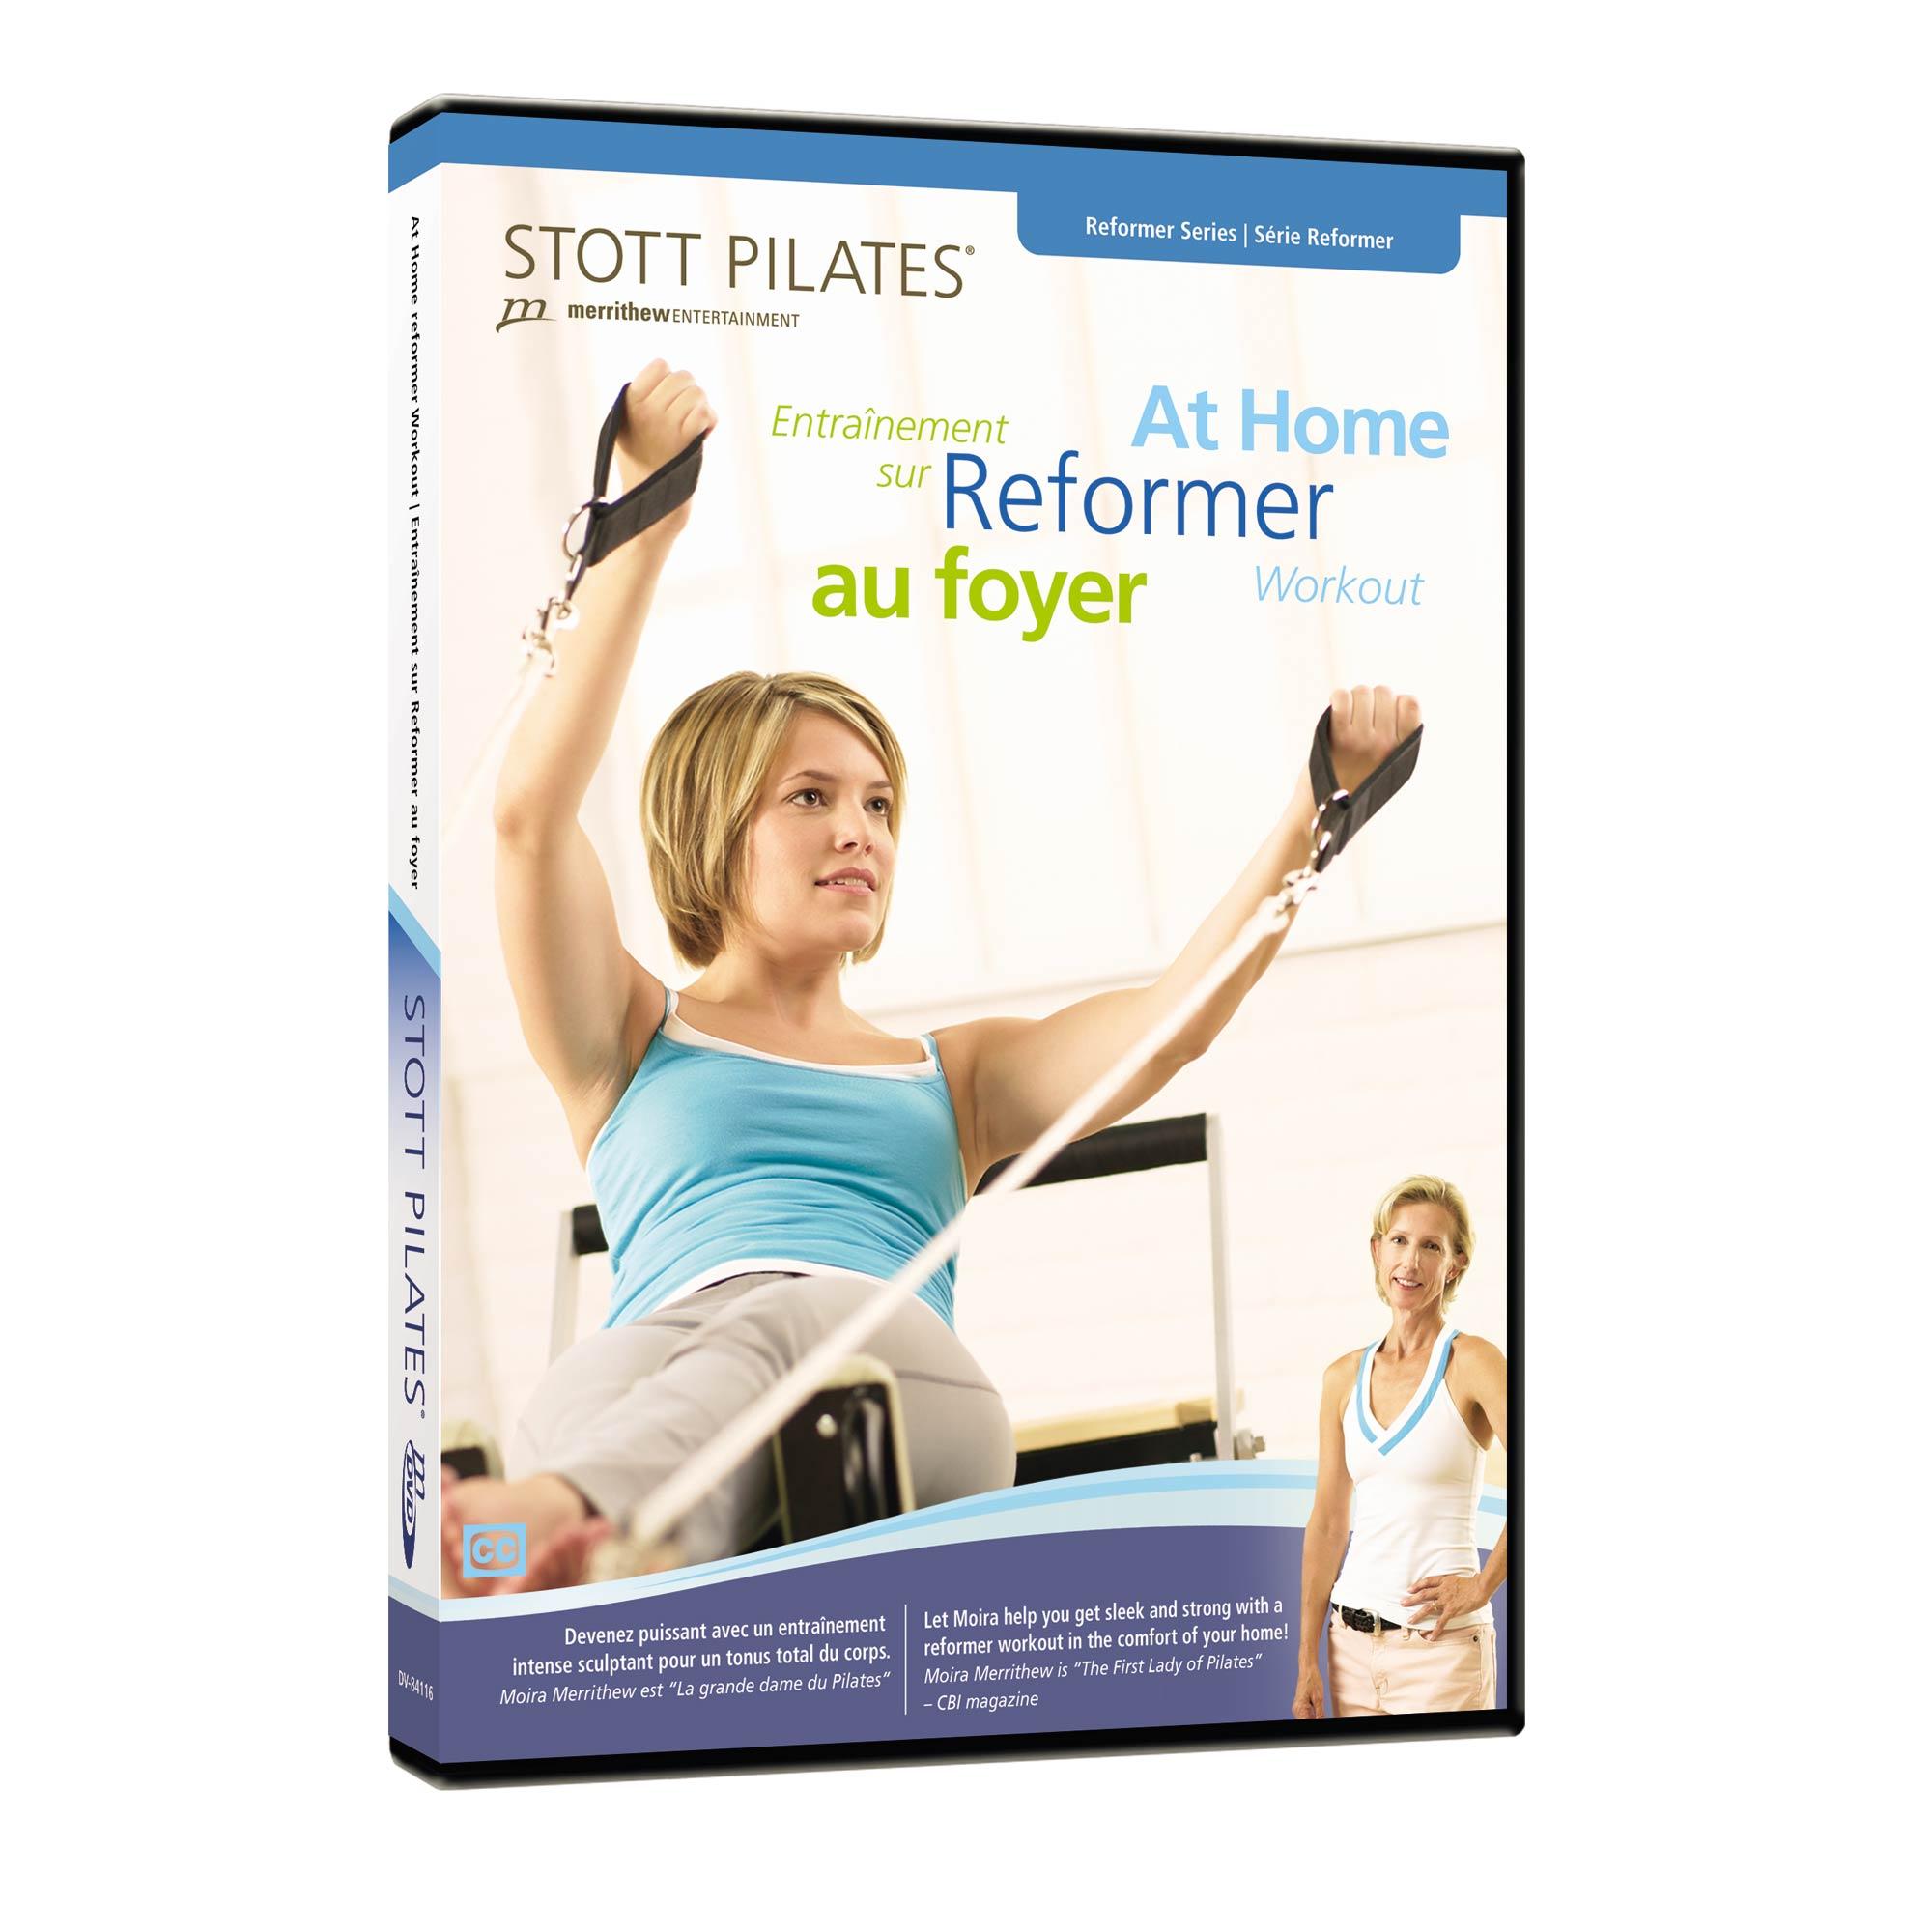 Charlotte S Fitness Dvd Reviews: Stott Pilates At Home Reformer Workout DVD